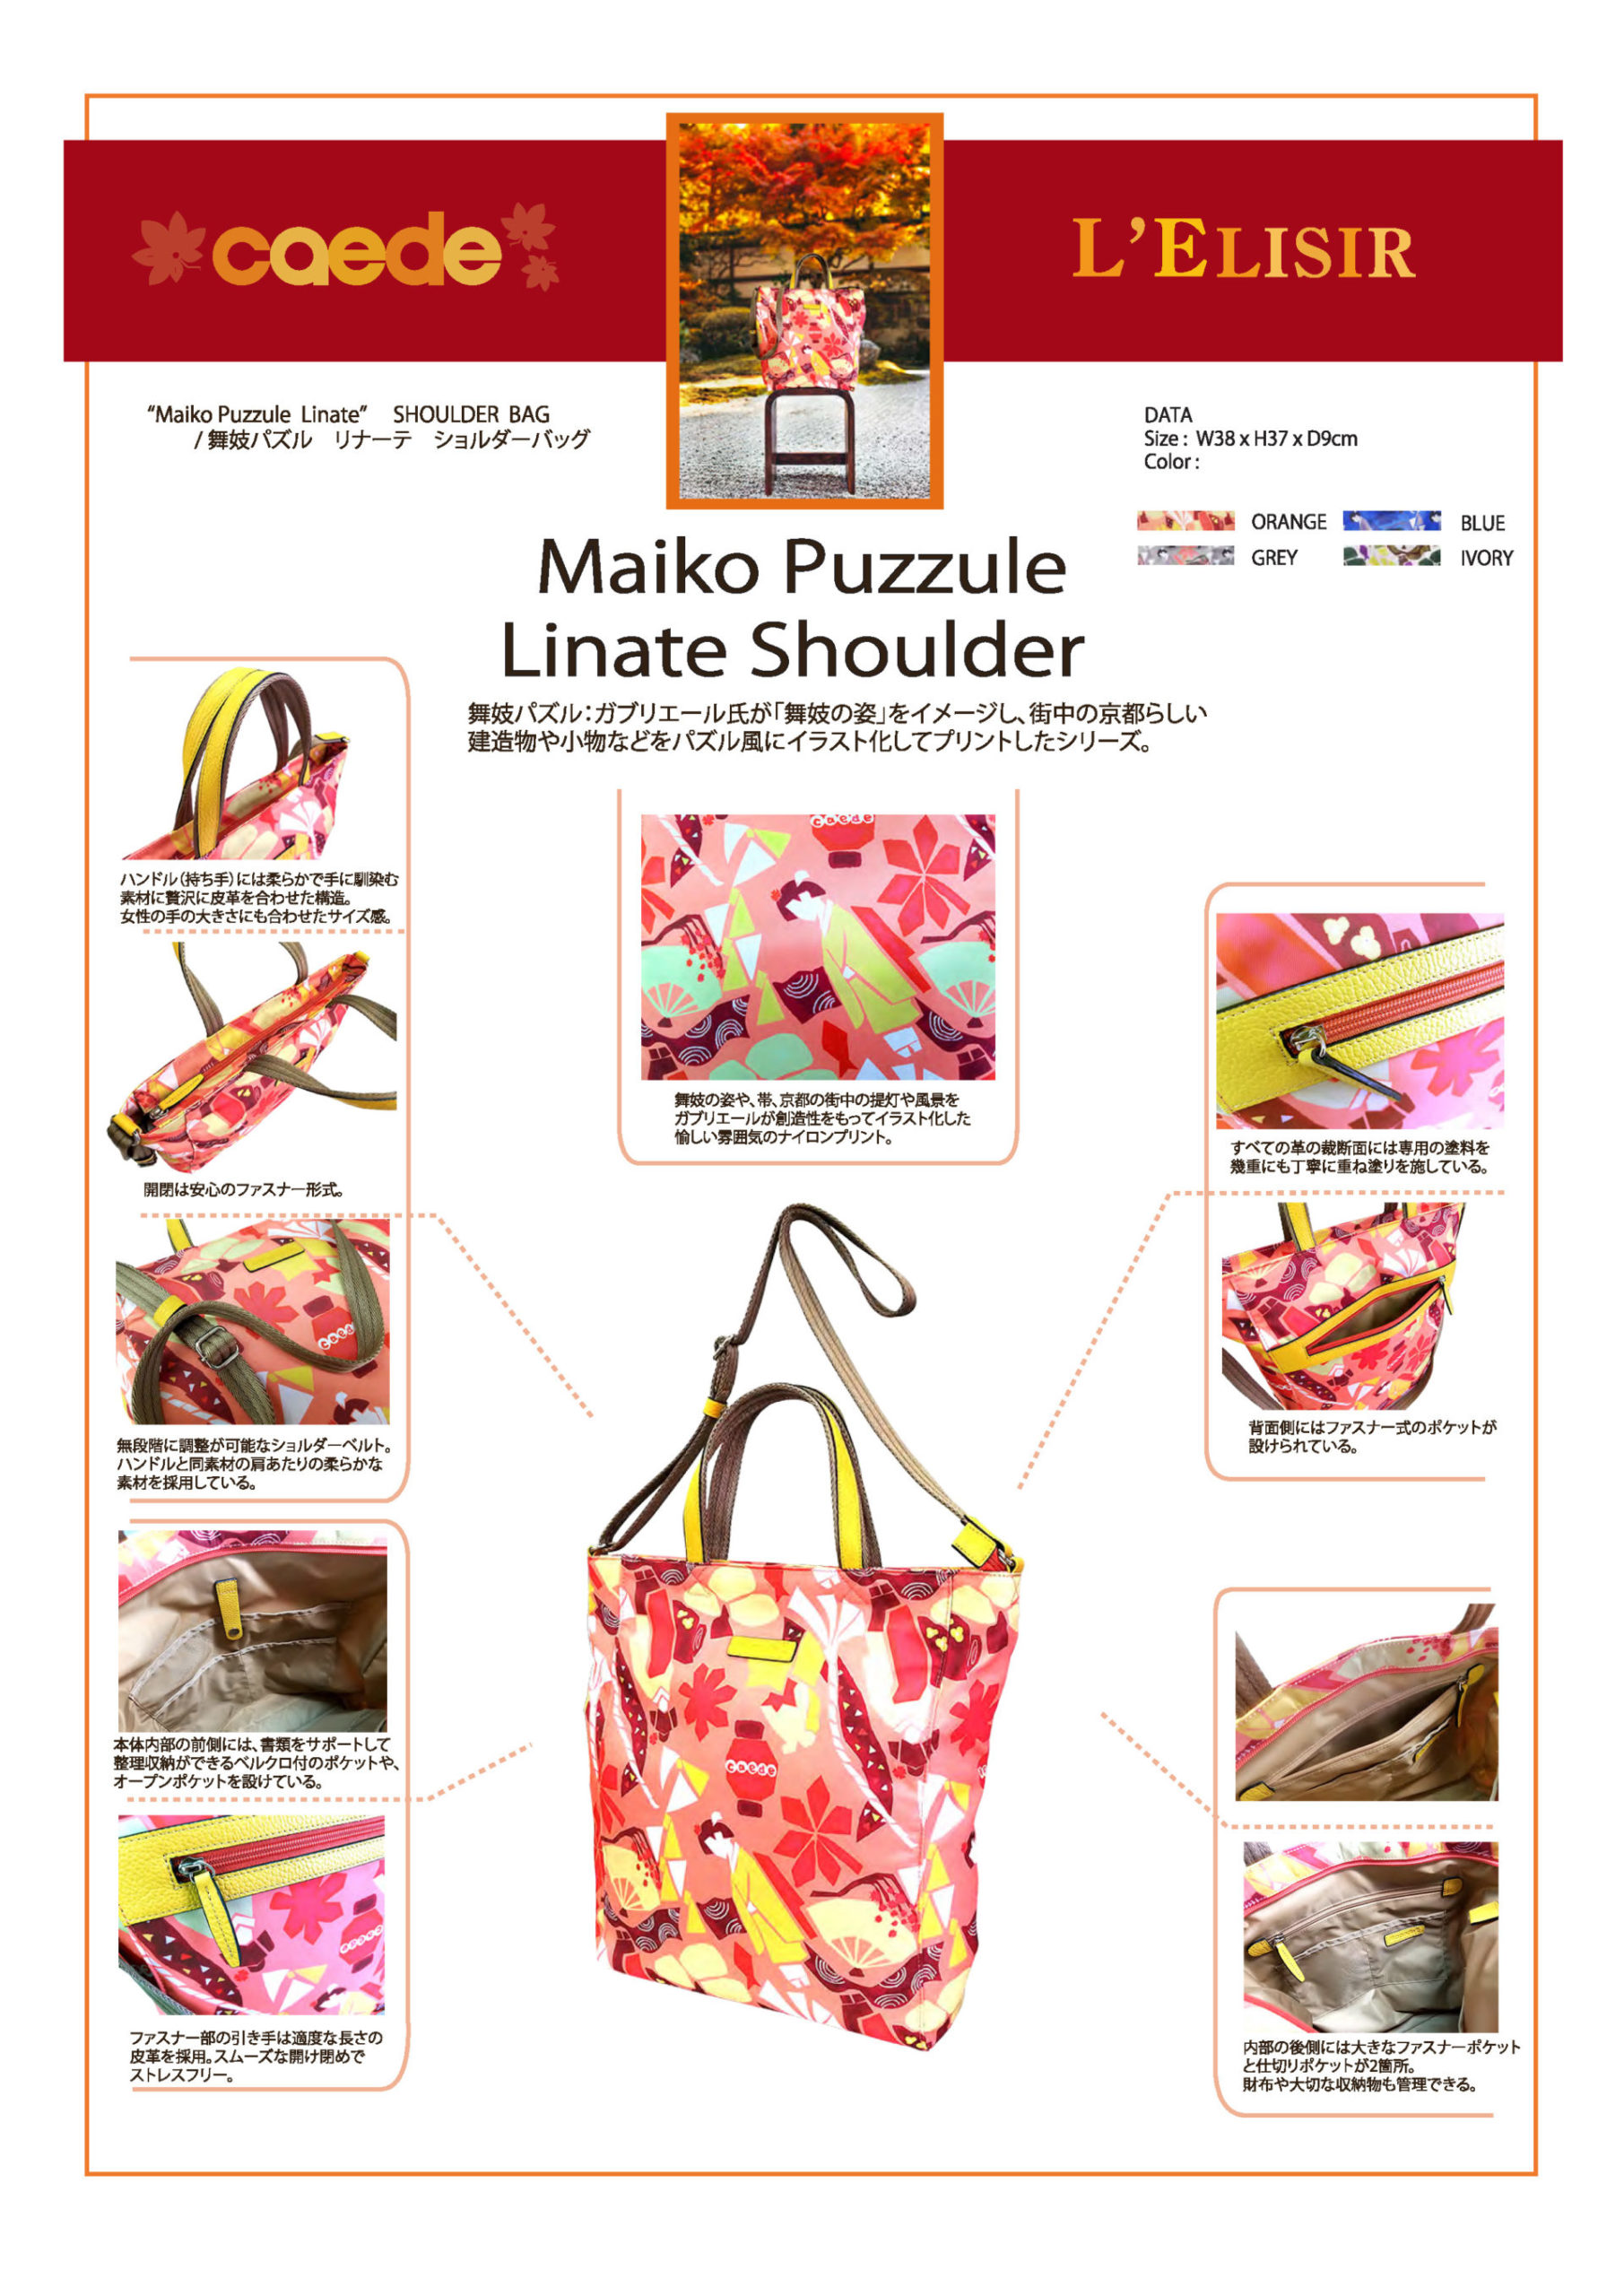 Maiko Puzzle Linate Shoulder